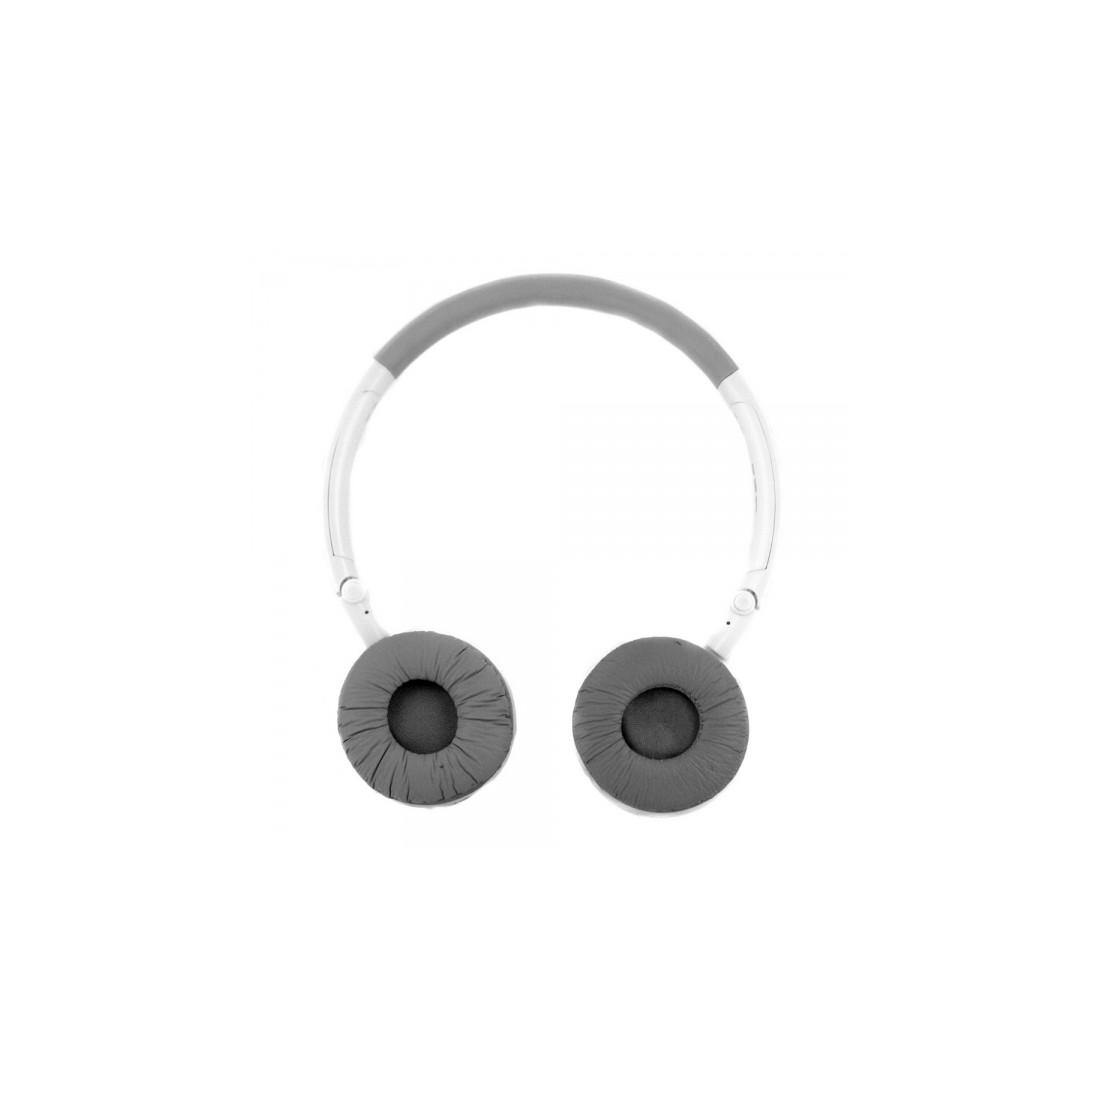 Auricular Diadema - Woxter WE26-017 BT60, Bluetooth, Blanco